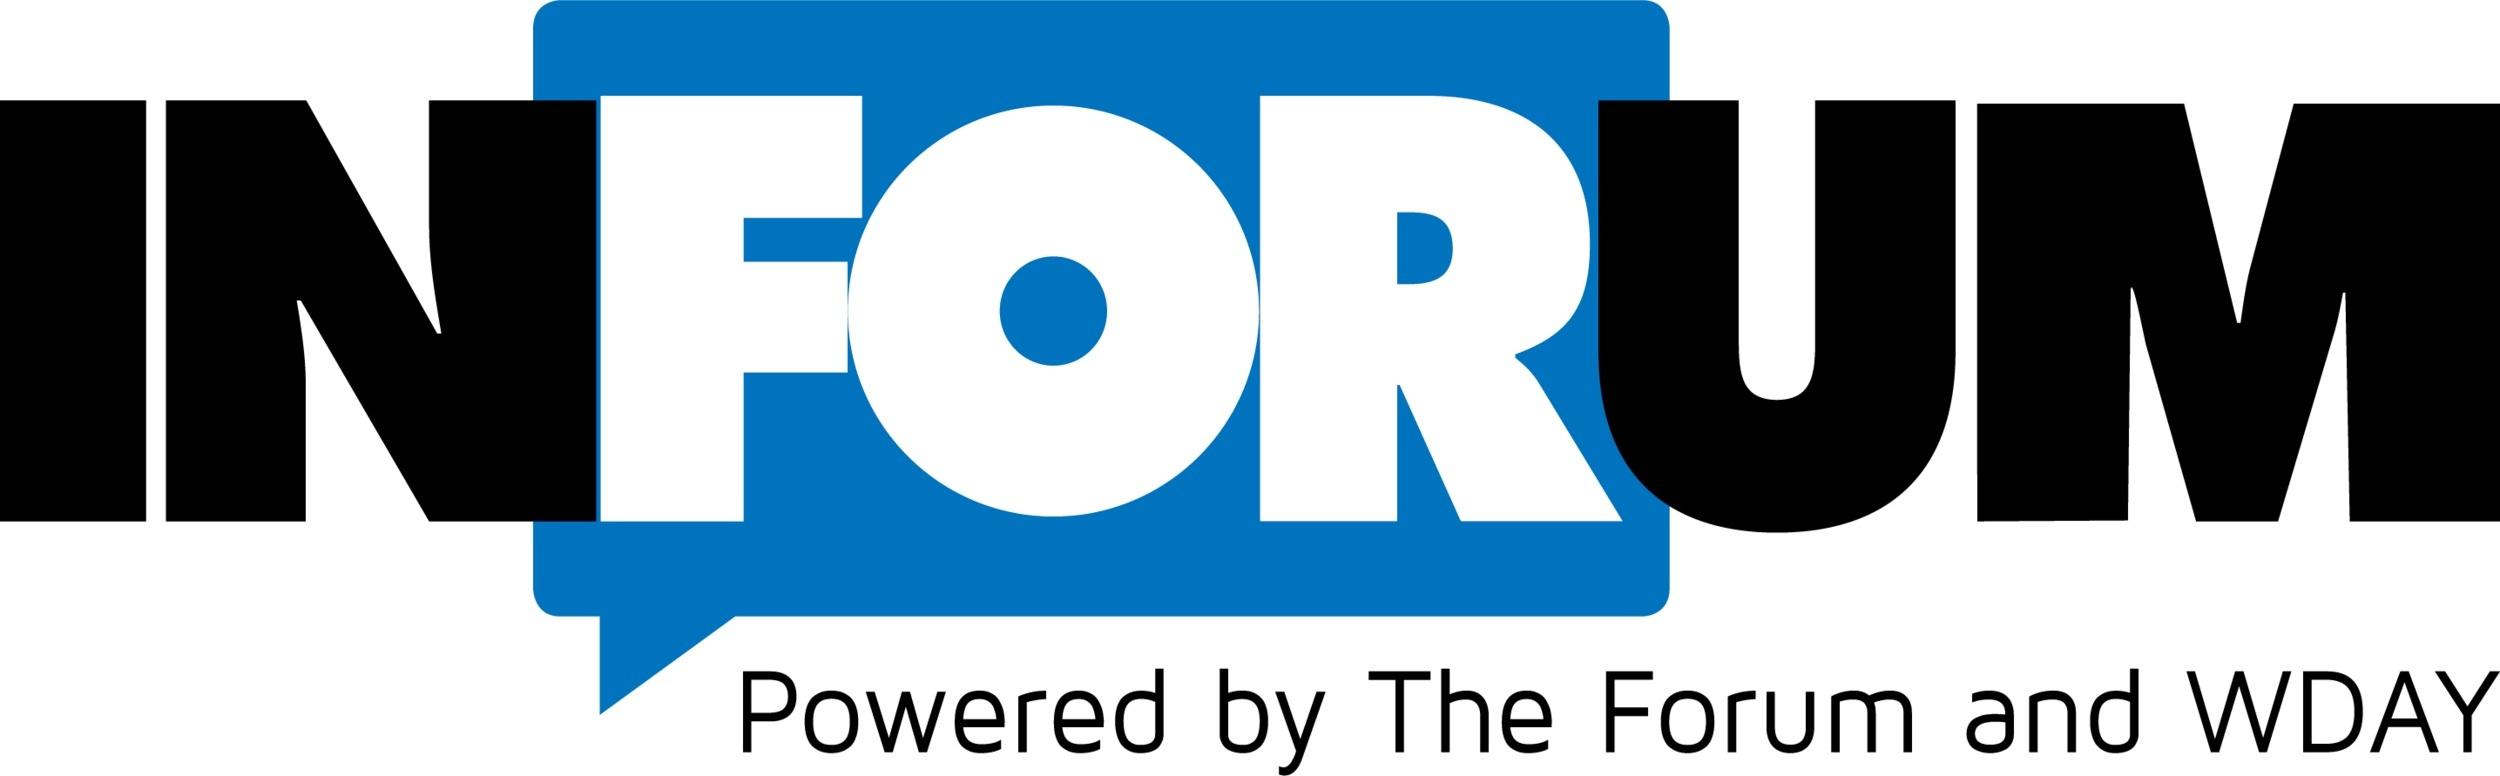 Inforum-logo.jpg